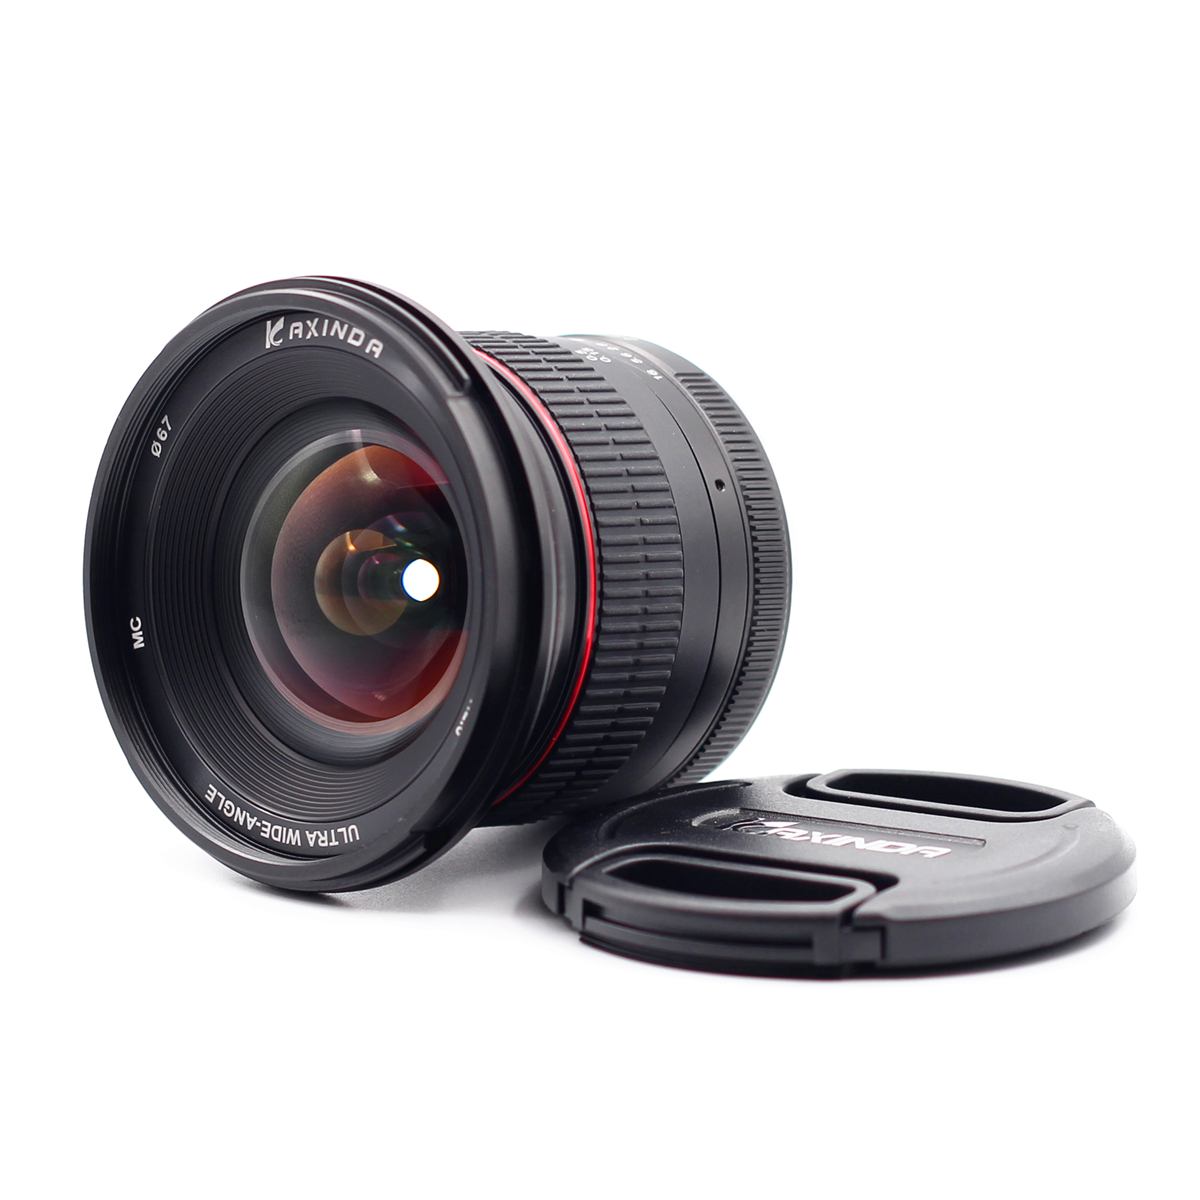 12mm f/2.8 Grand Angle Objectif Manuel pour Fujifilm Fuji X-T3 X-T2 X-T1 X-T20 X-T100 X-PRO2 X-E3 X-E2 X-E1 X-A3 X-A2 X-A20 12mm F2.8